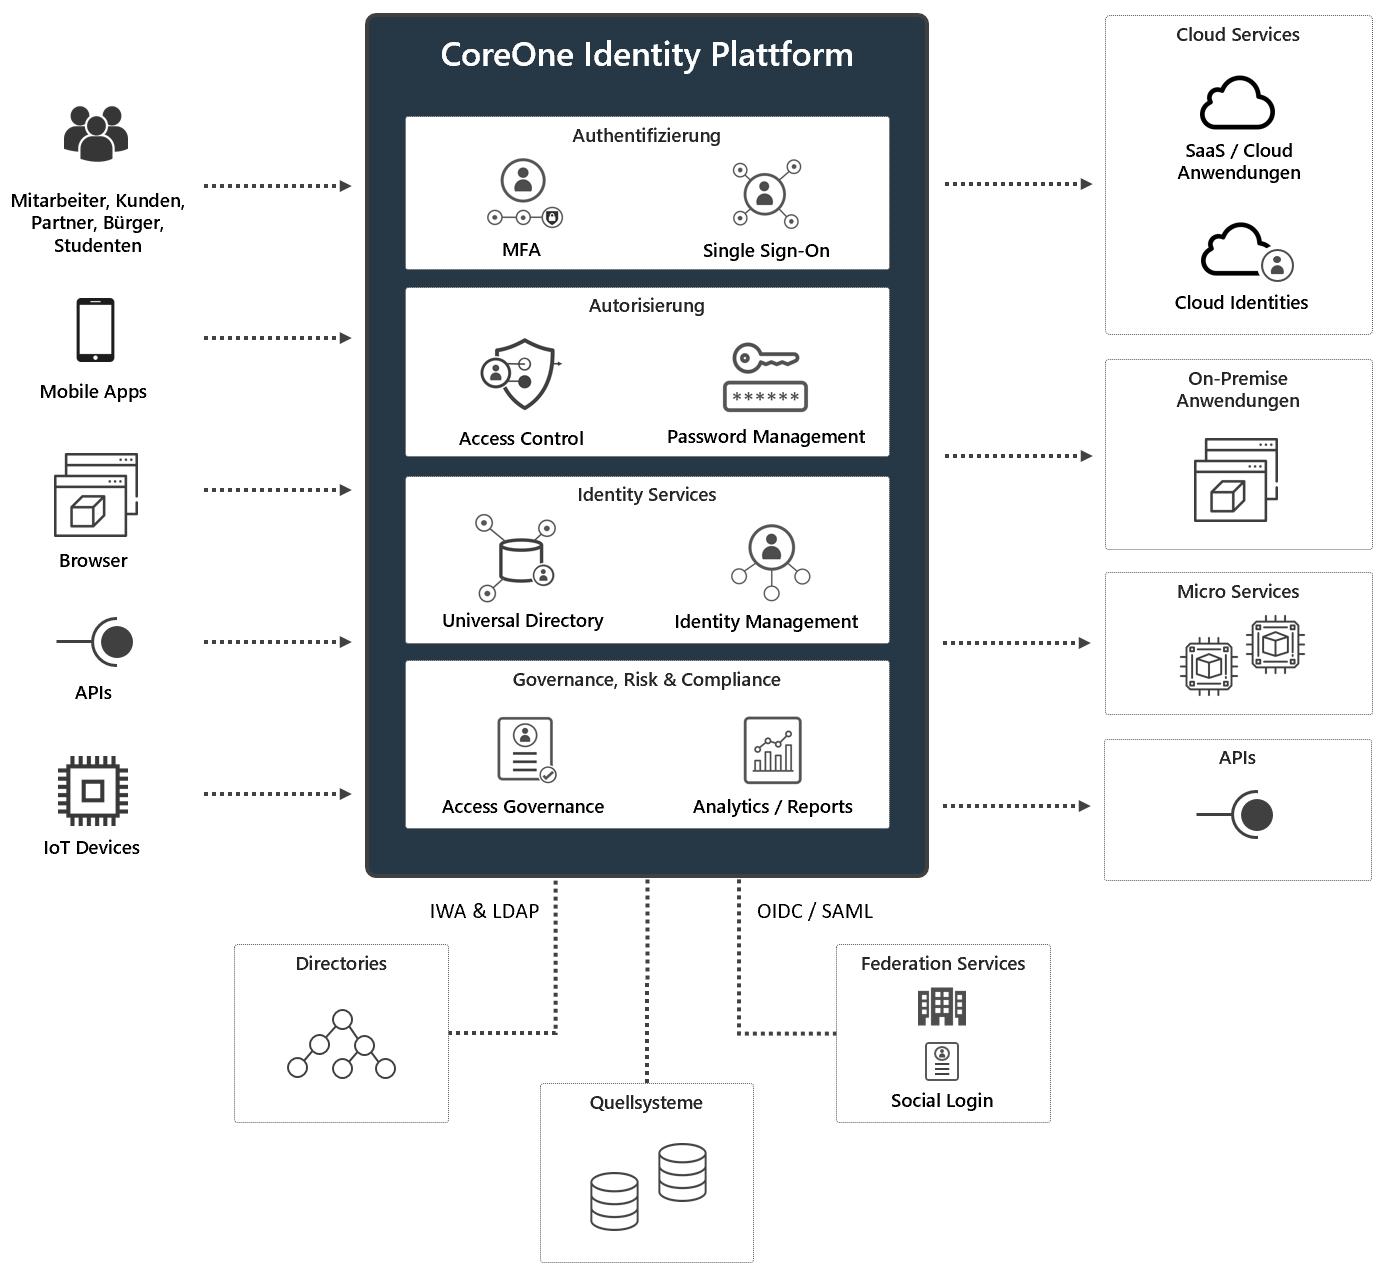 CoreOne Identity Plattform